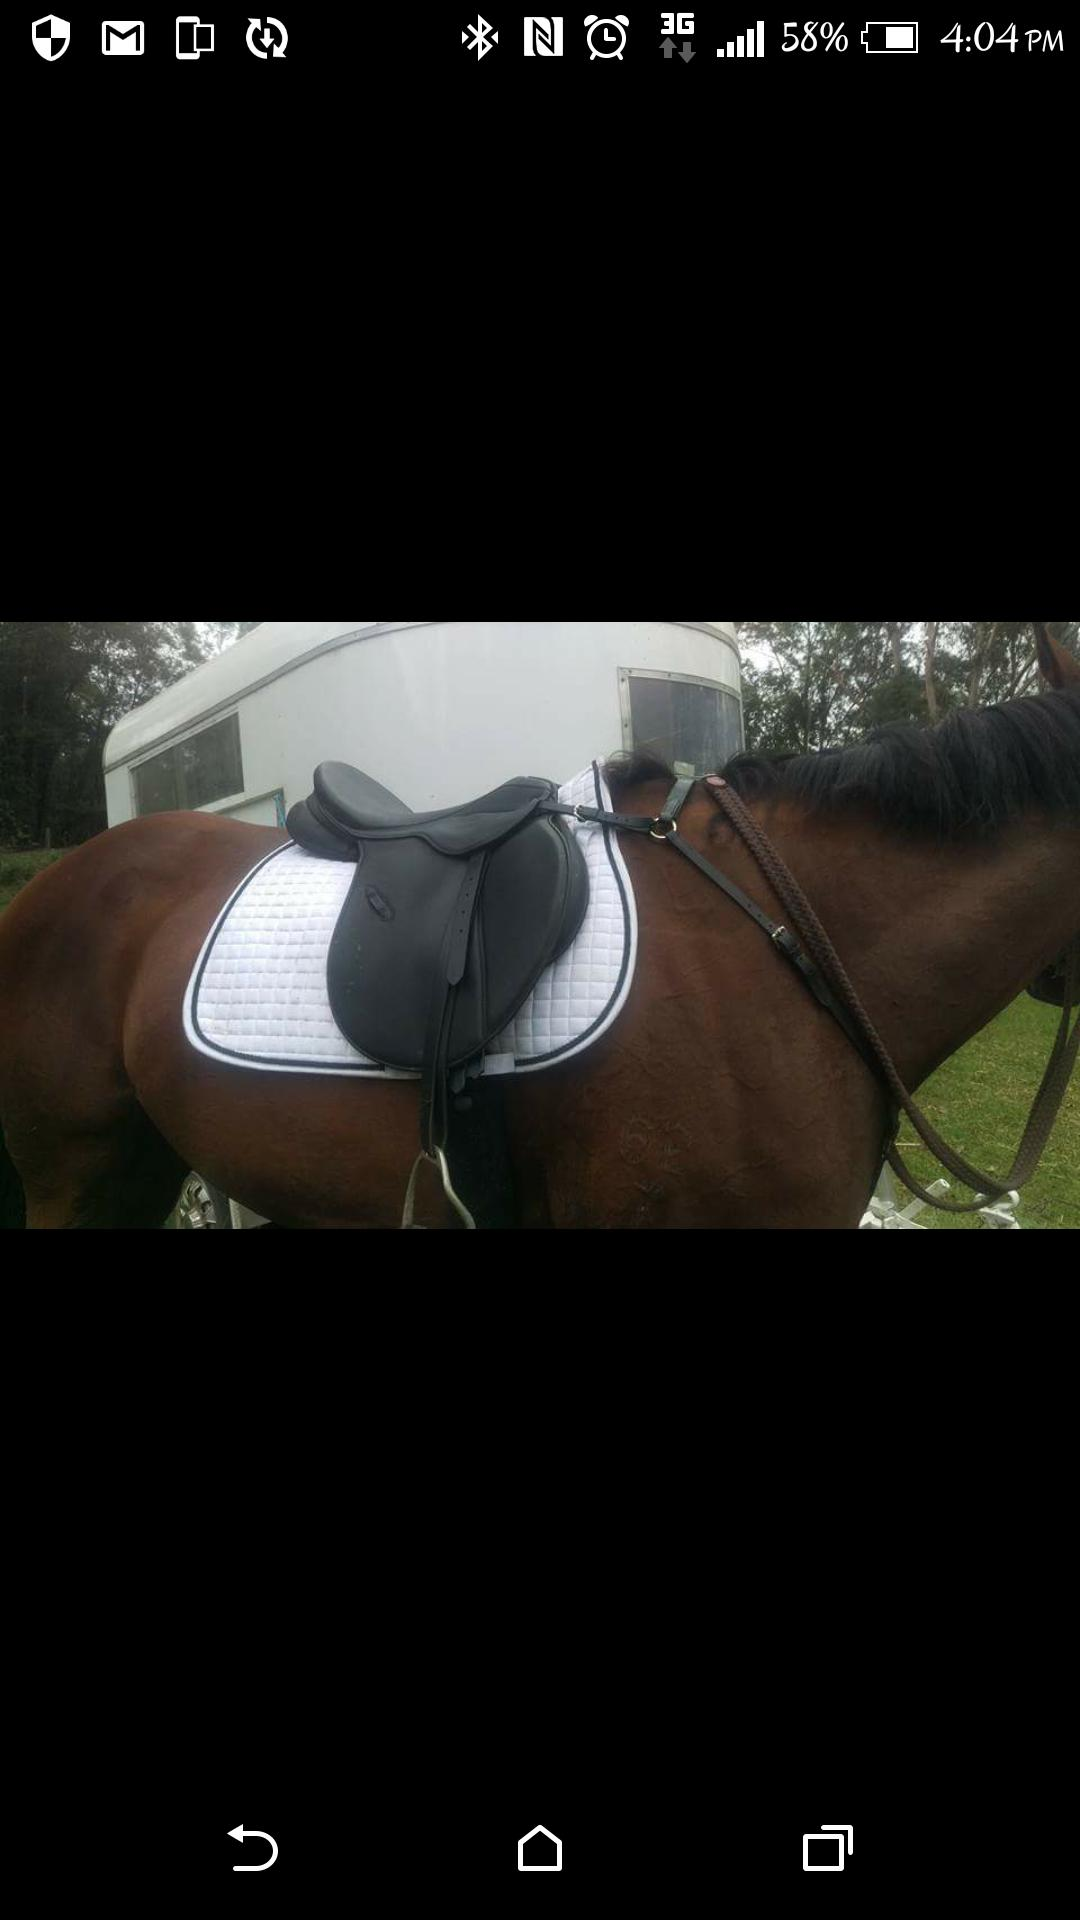 "Thorowgood AP 17"" Saddle"